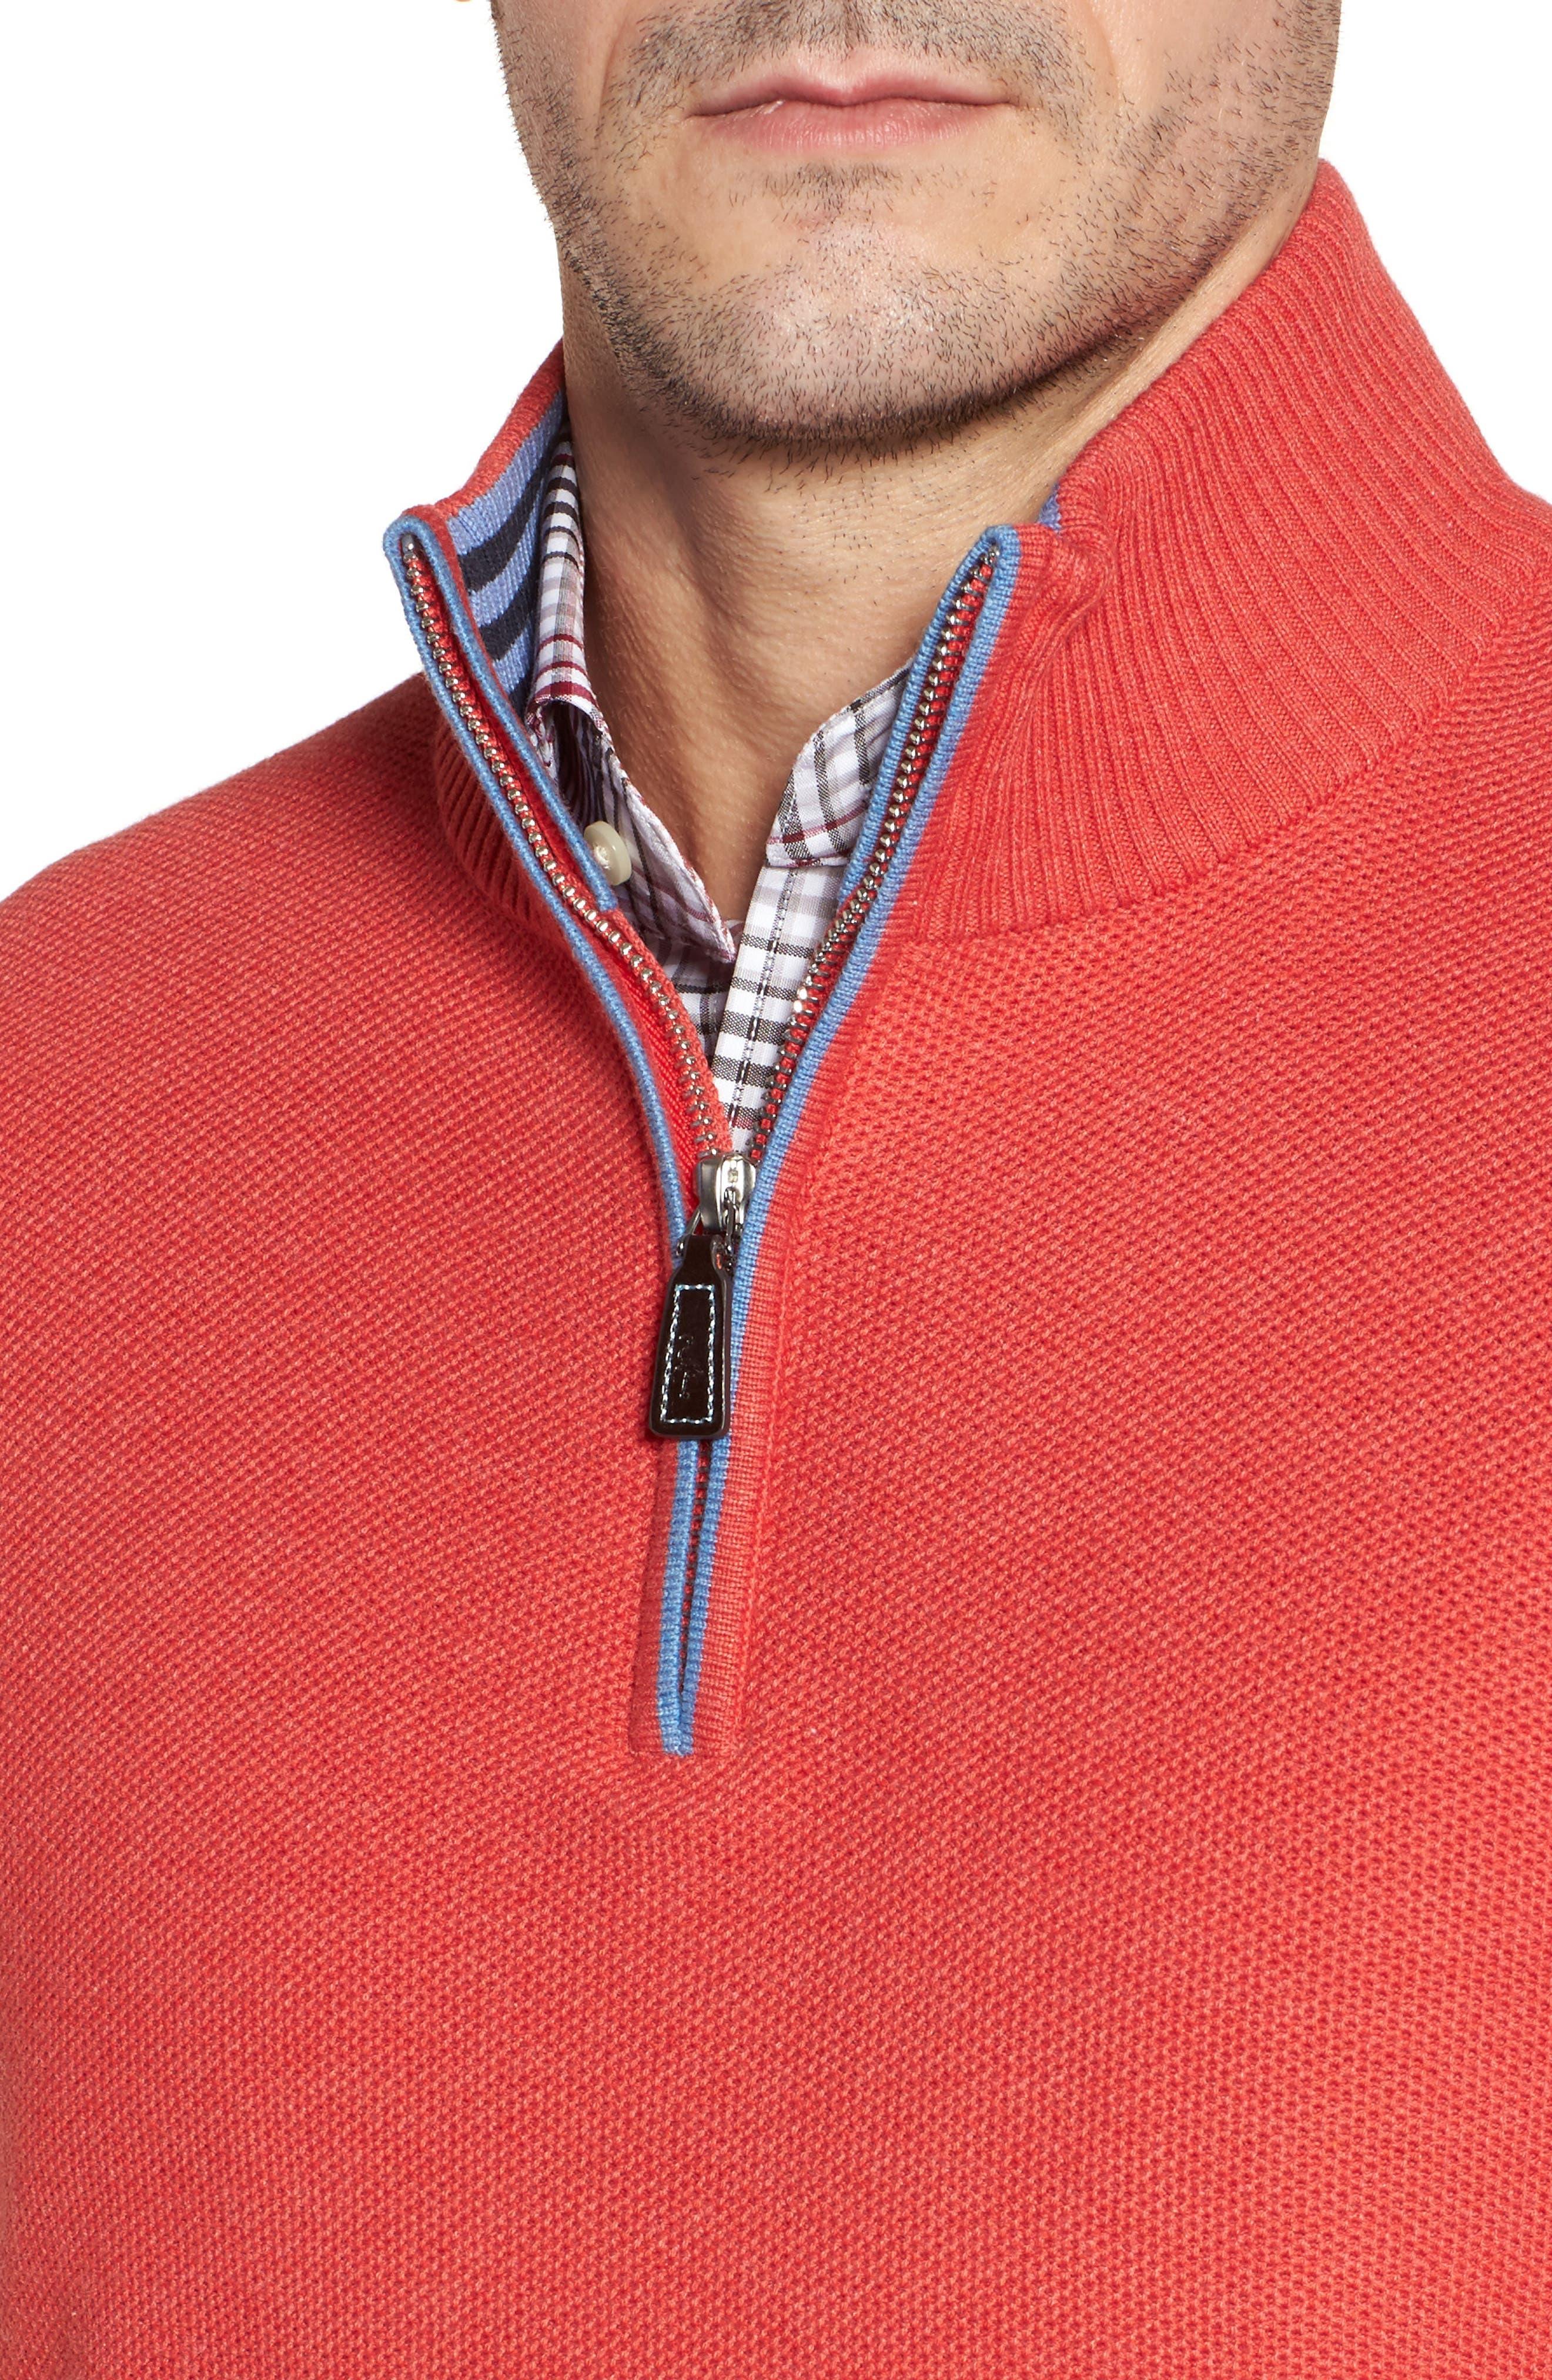 Sorrel Tipped Quarter Zip Sweater,                             Alternate thumbnail 4, color,                             Coral